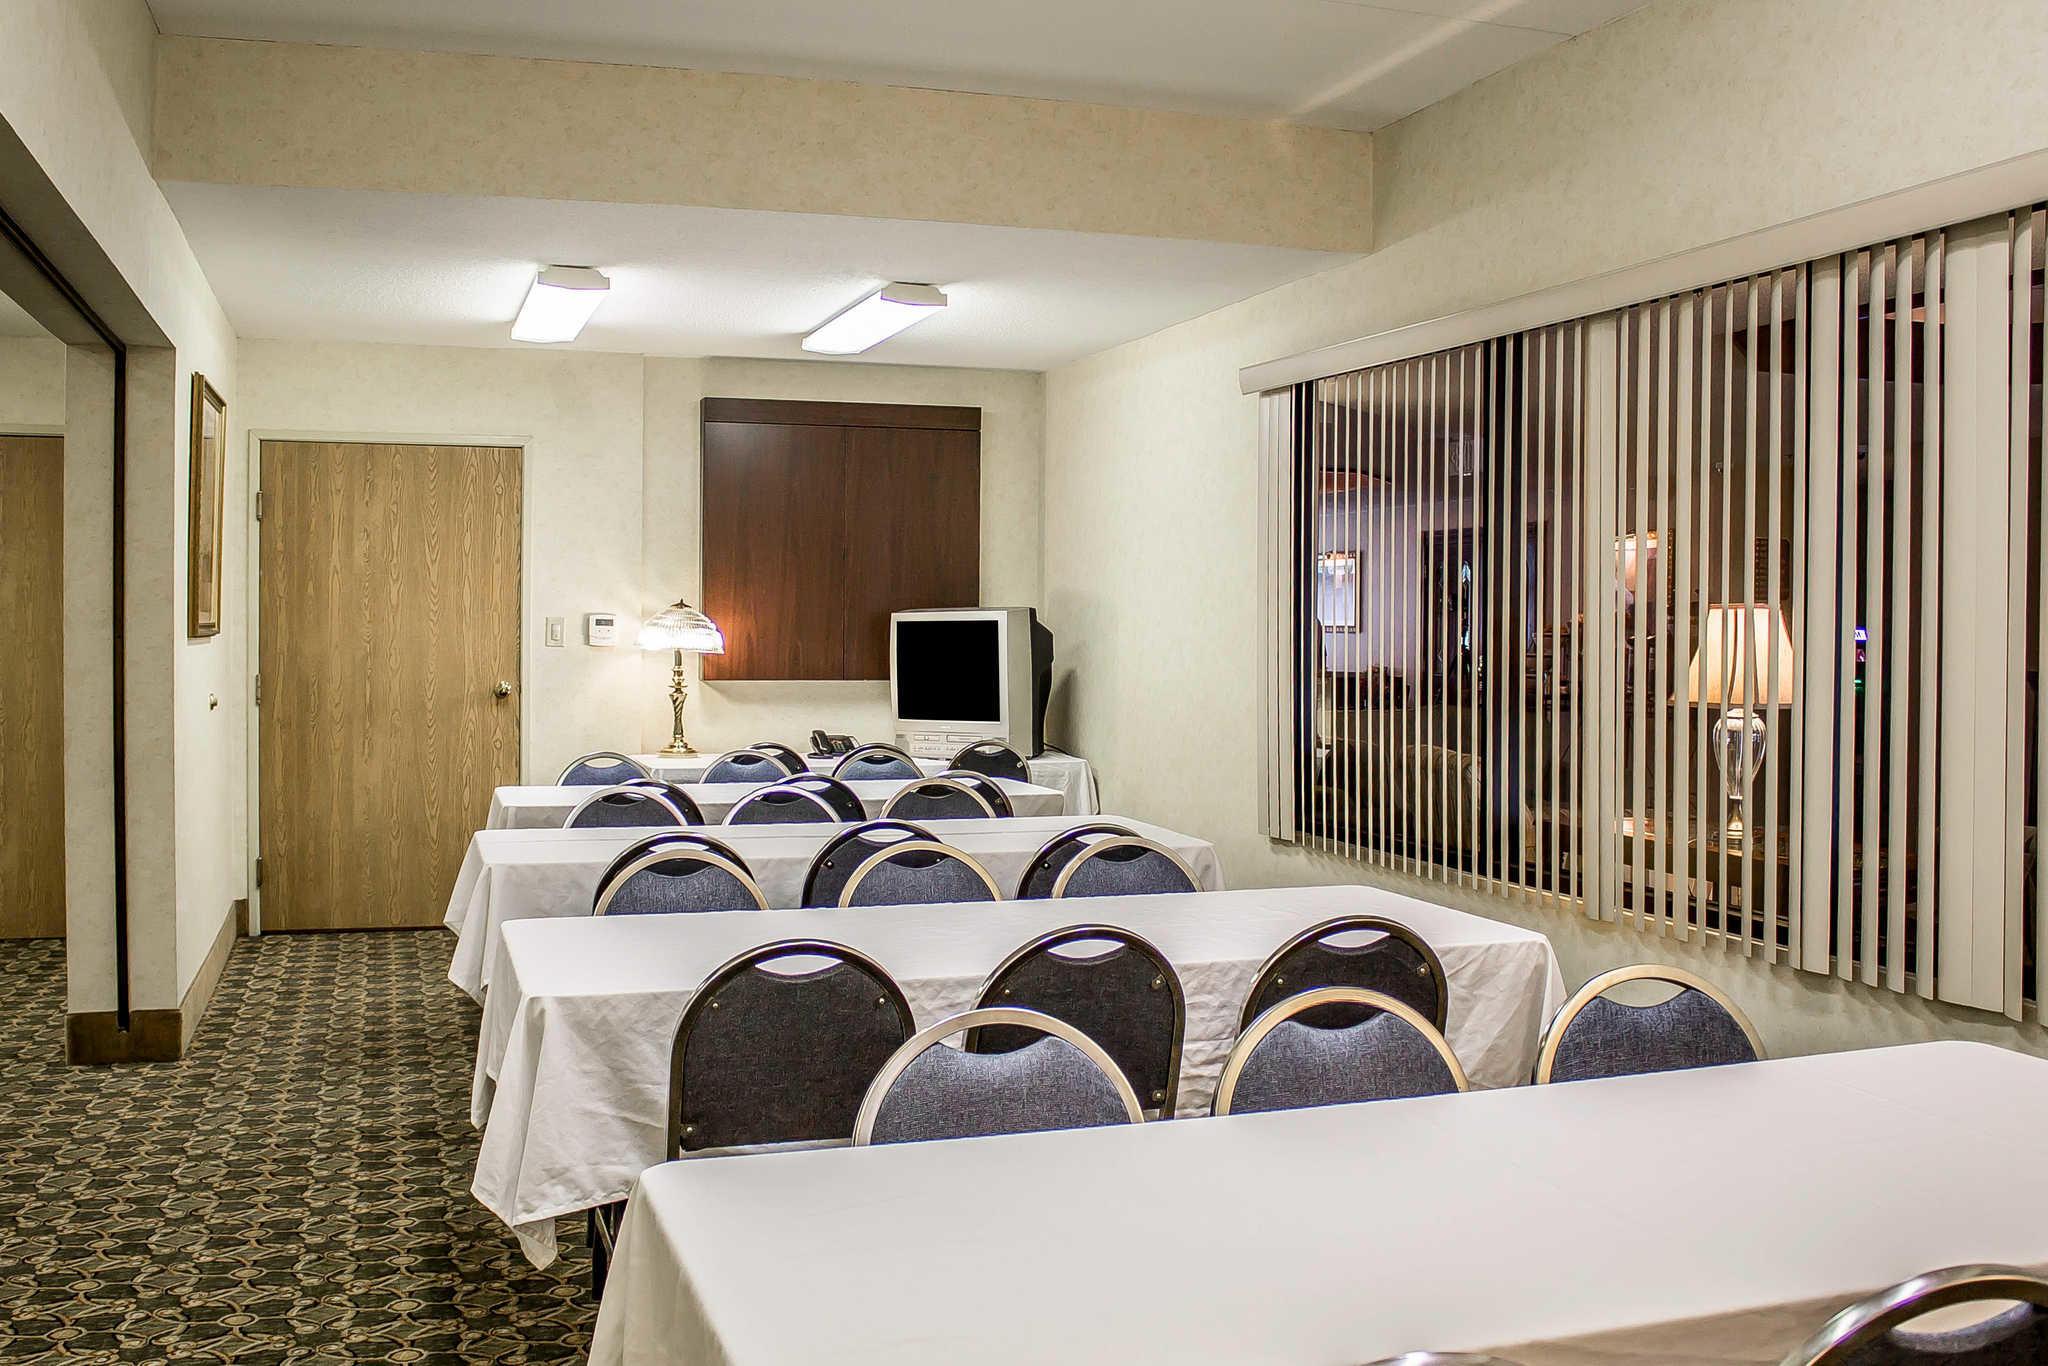 Comfort Inn & Suites image 38